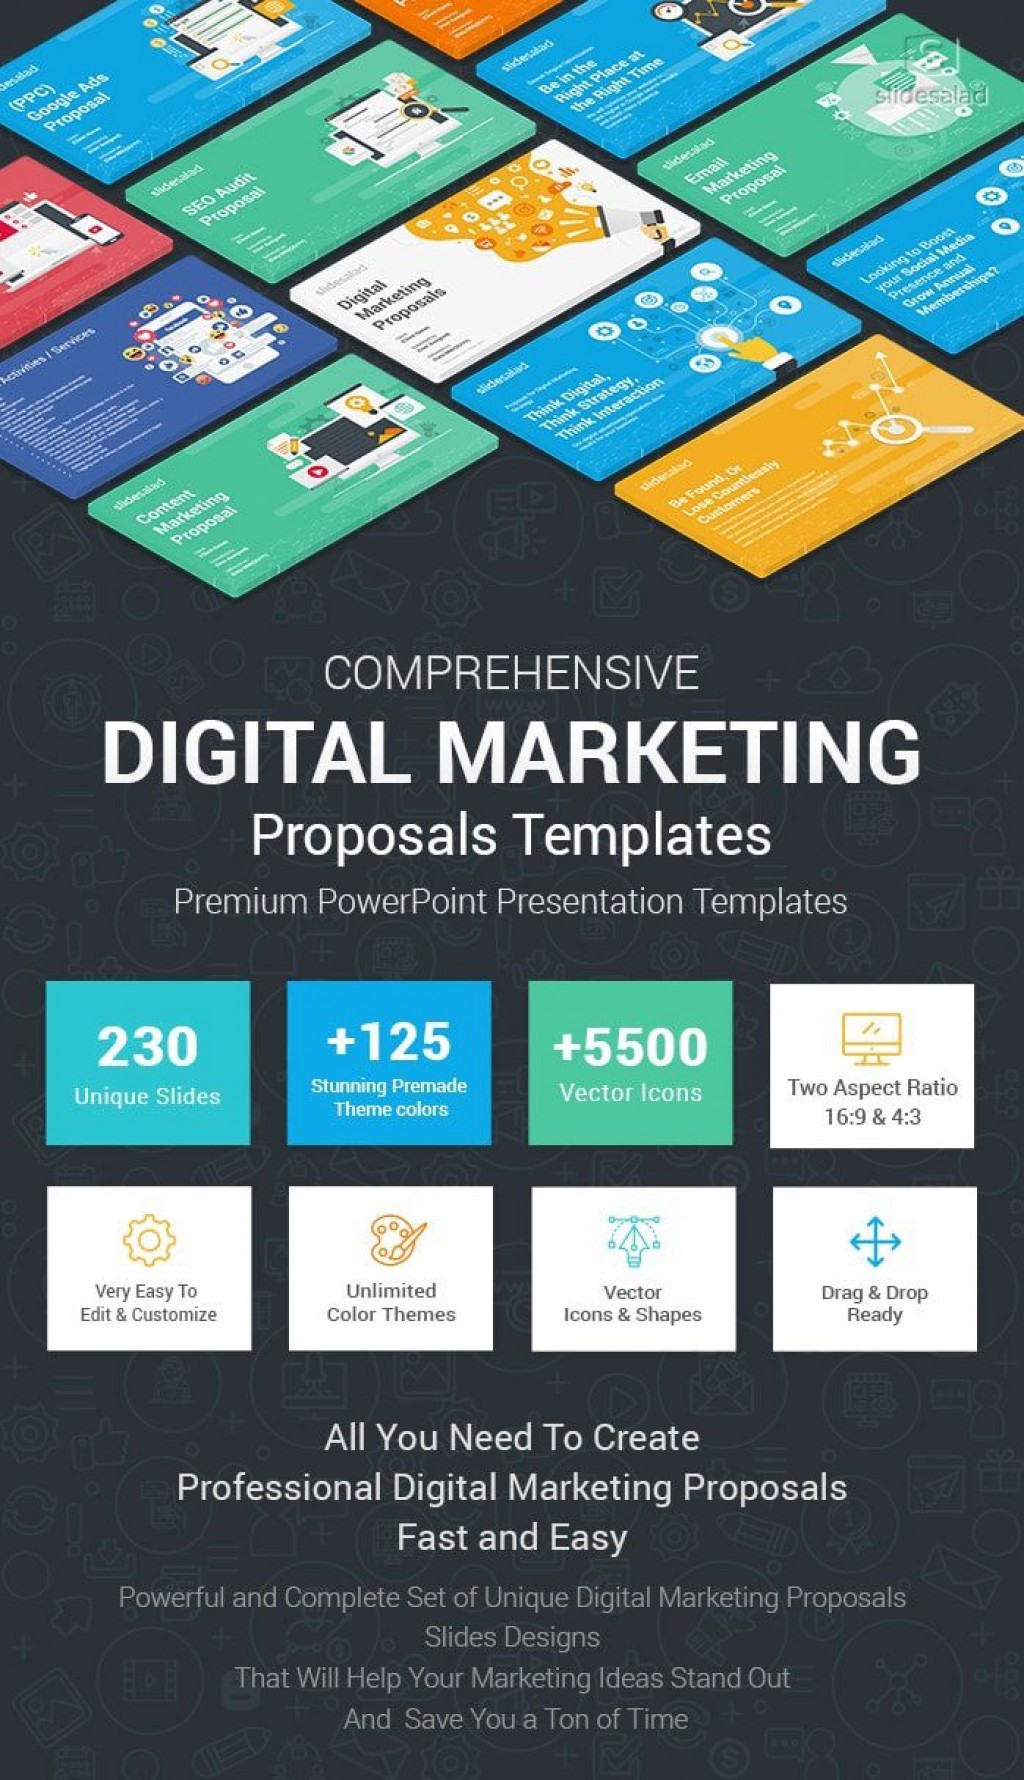 006 Amazing Digital Marketing Plan Sample Ppt Design Large